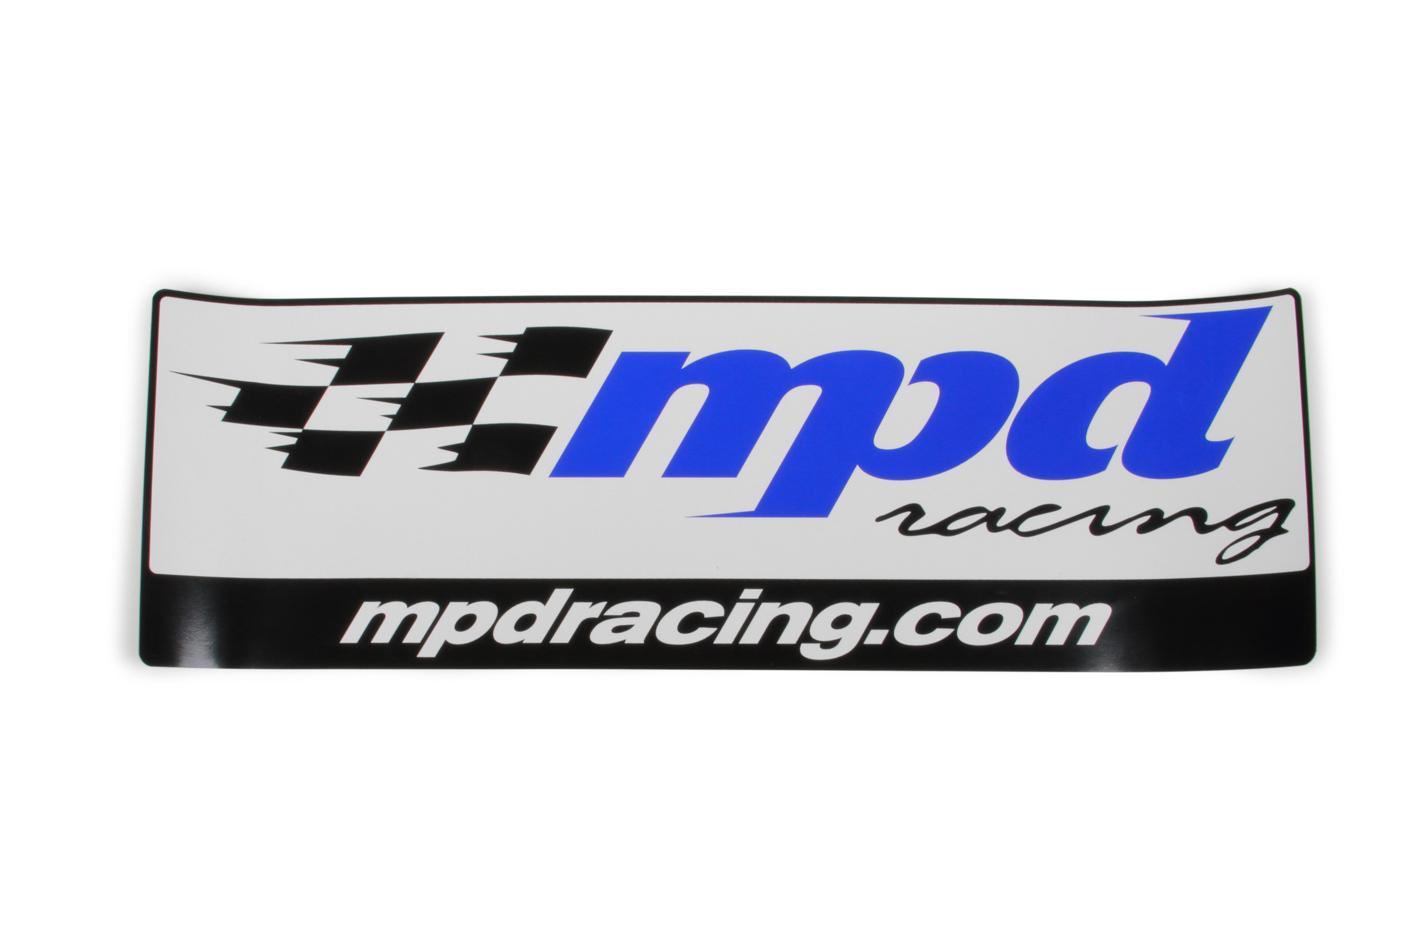 Mpd Racing MPD Decal 6x18